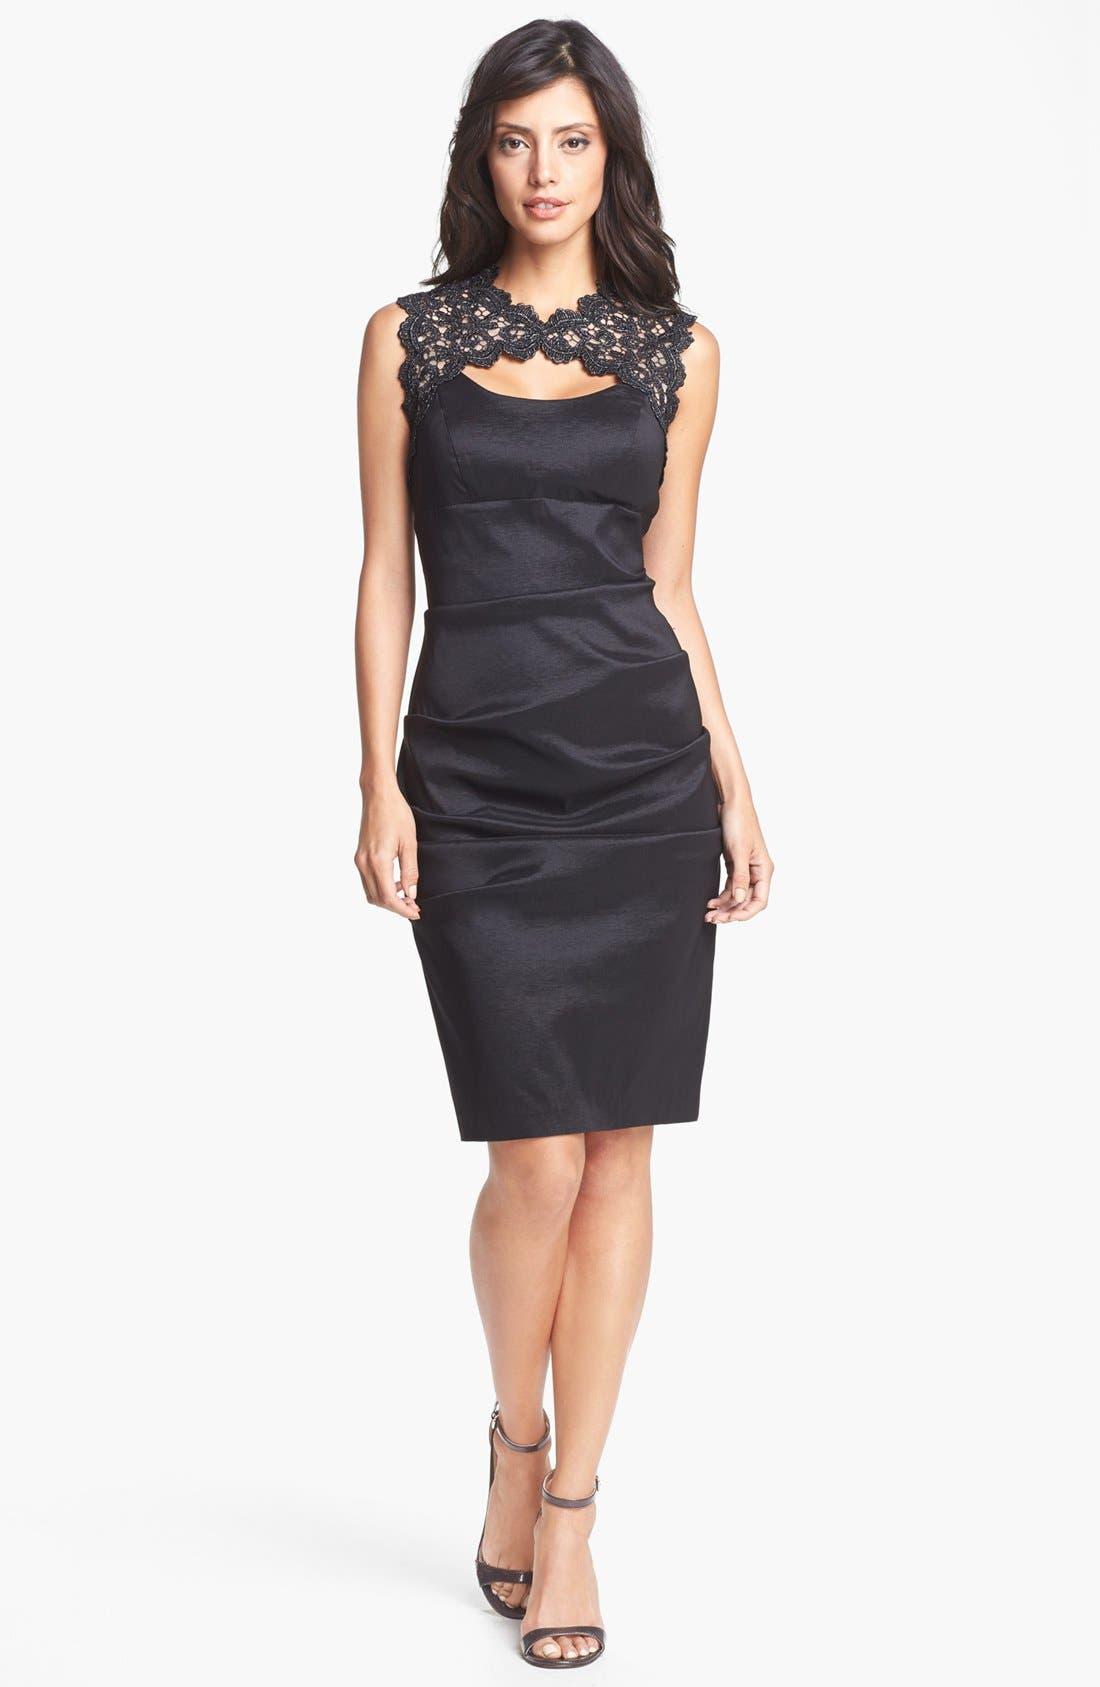 Alternate Image 1 Selected - Xscape Lace Yoke Ruched Taffeta Sheath Dress